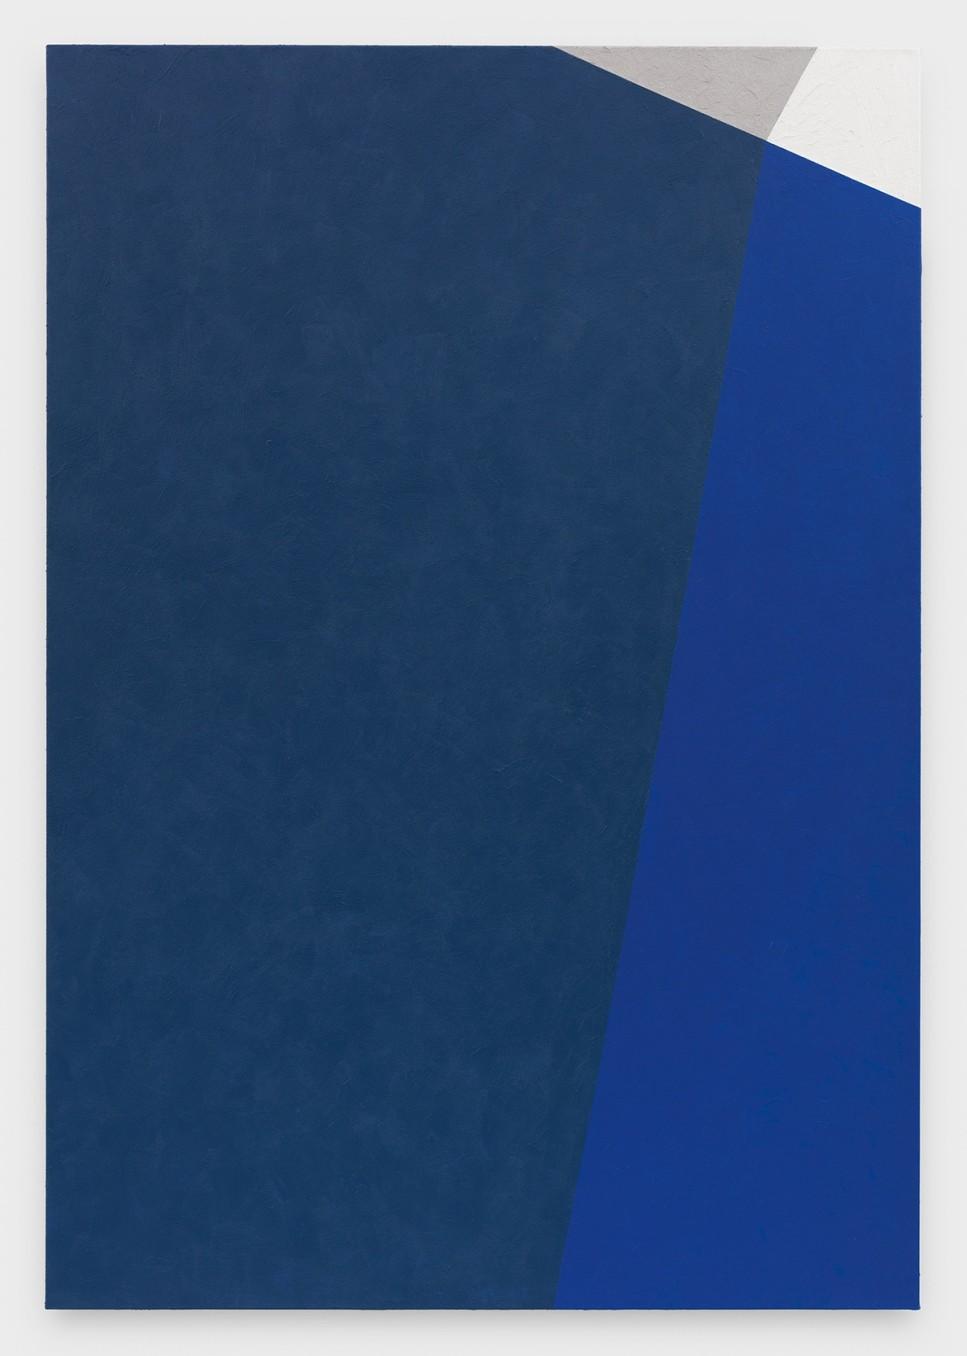 Virginia Jaramillo, Site: No. 12 38.4824° N, 22.5010° E, 2018, Acrylic on canvas, 198.1 x 137.2 cm, 78 x 54 in